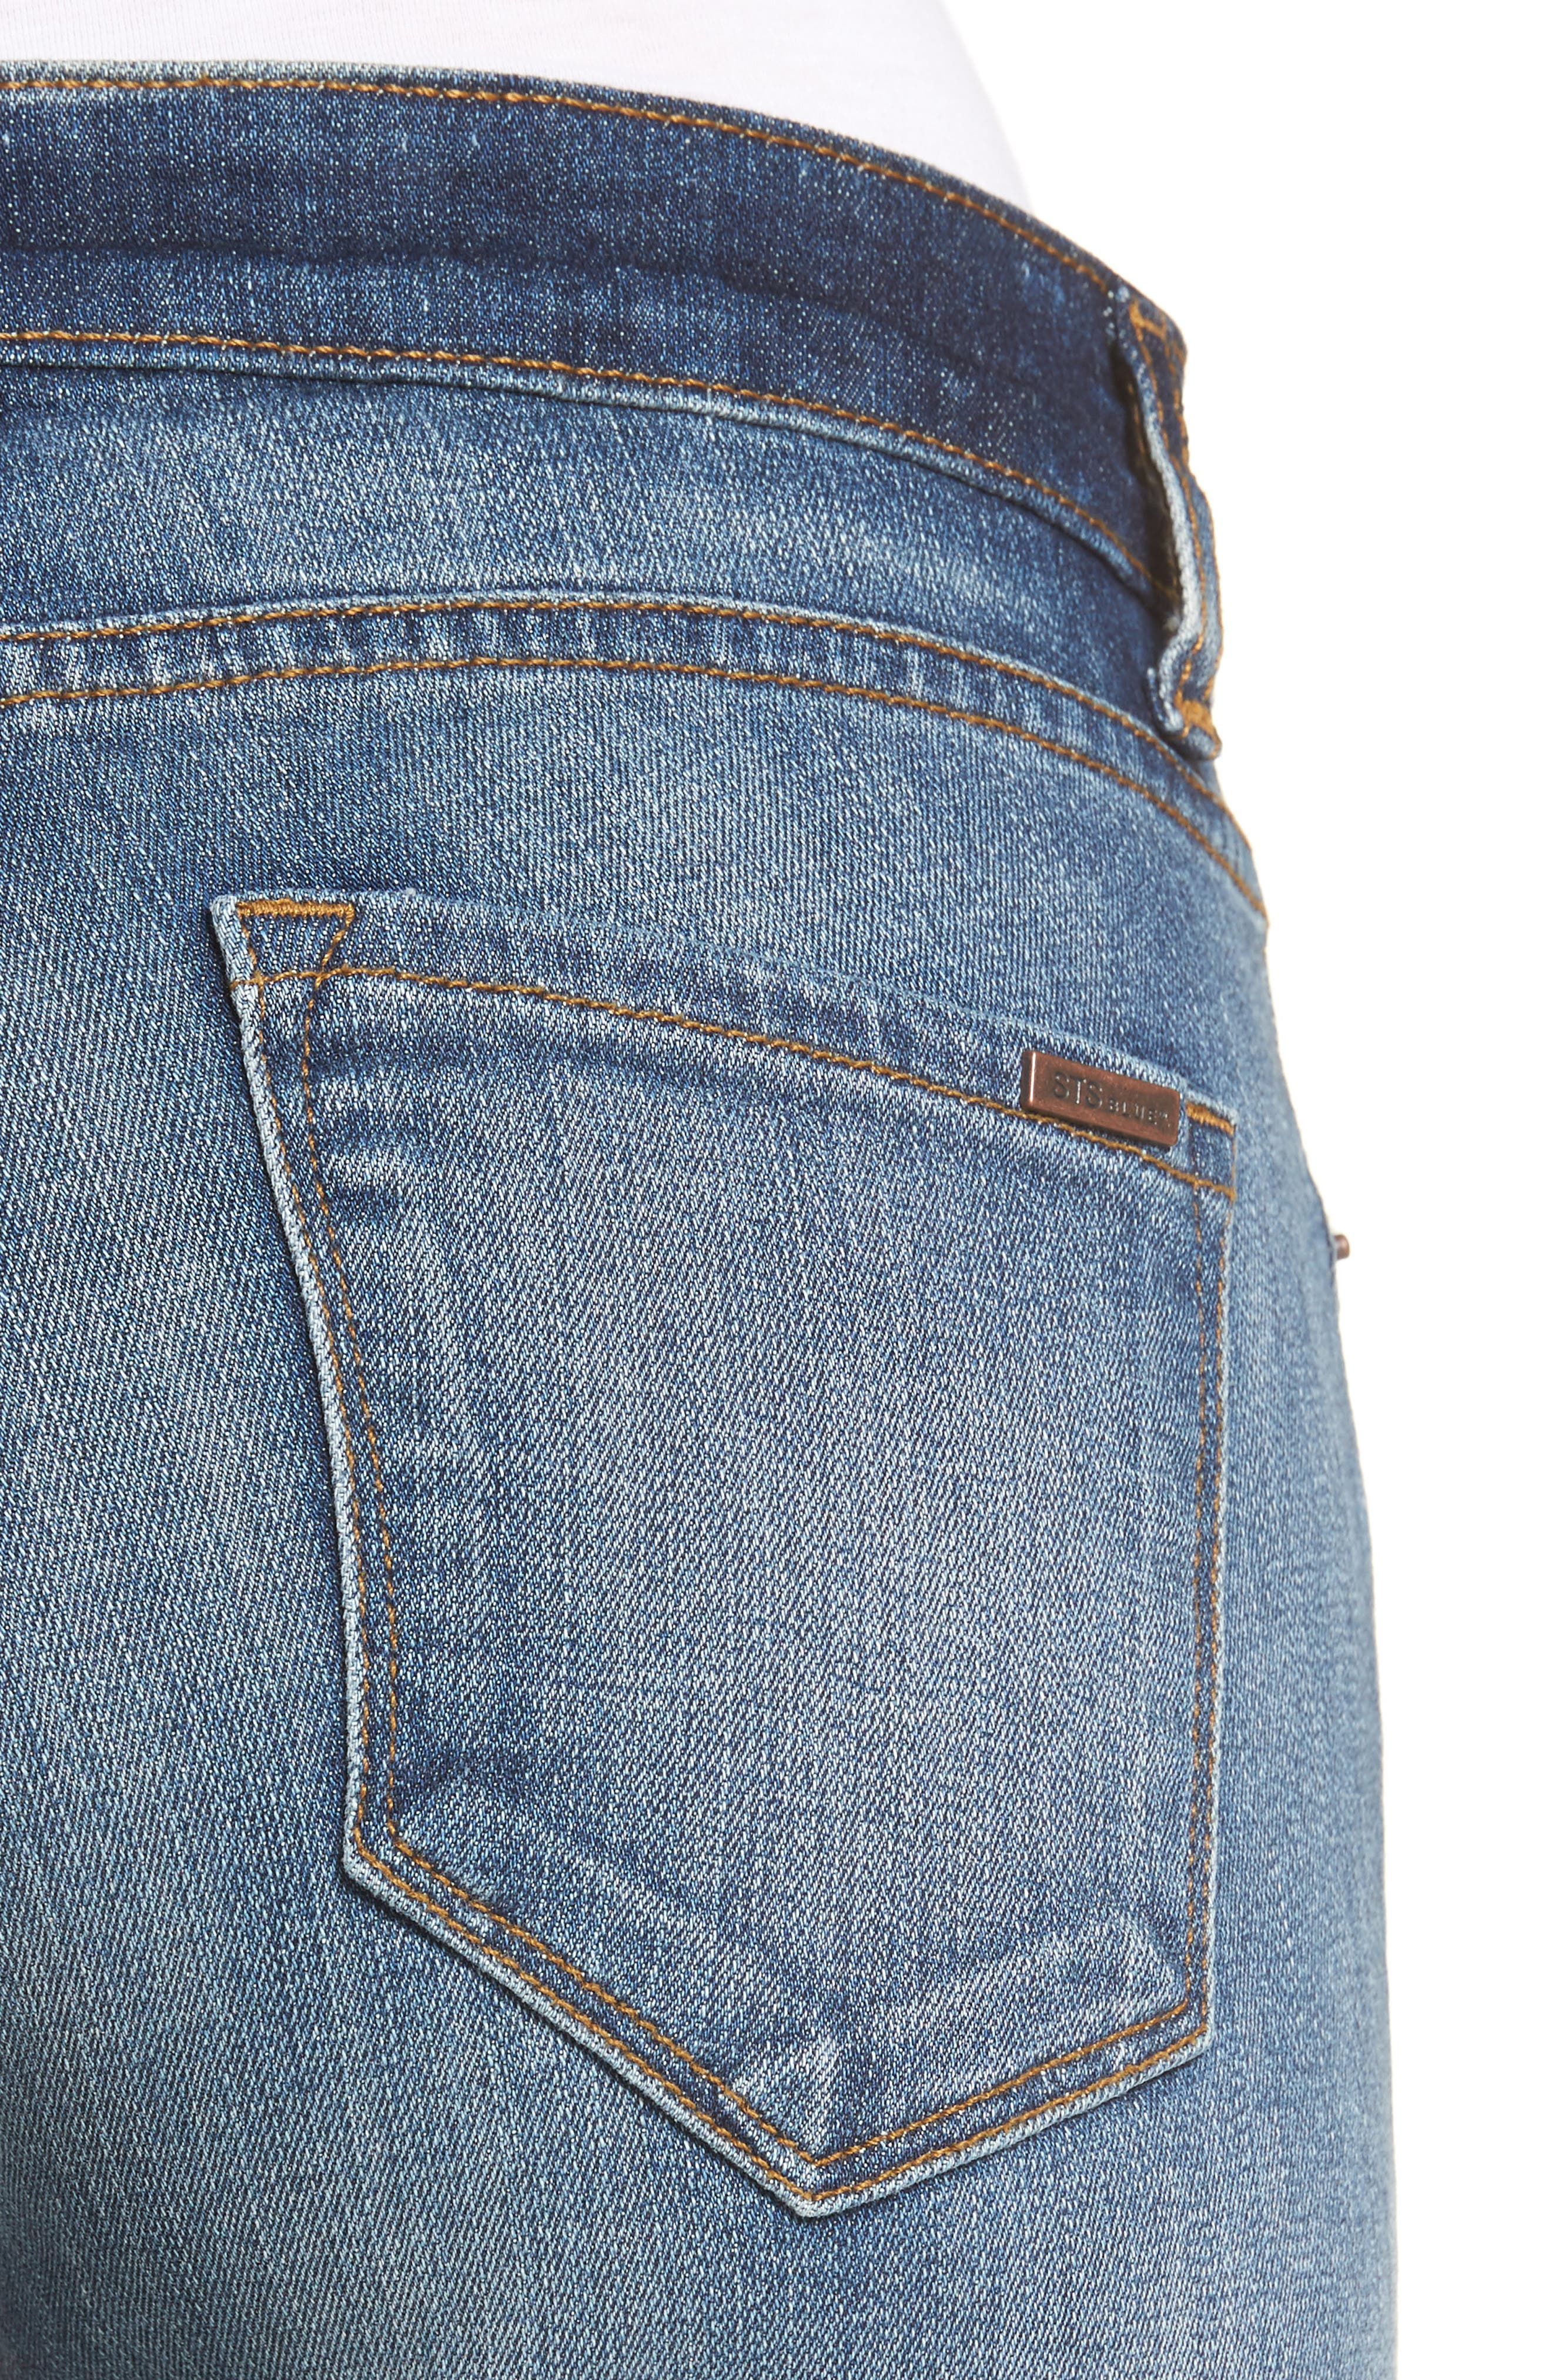 Taylor Colorblock Straight Leg Jeans,                             Alternate thumbnail 4, color,